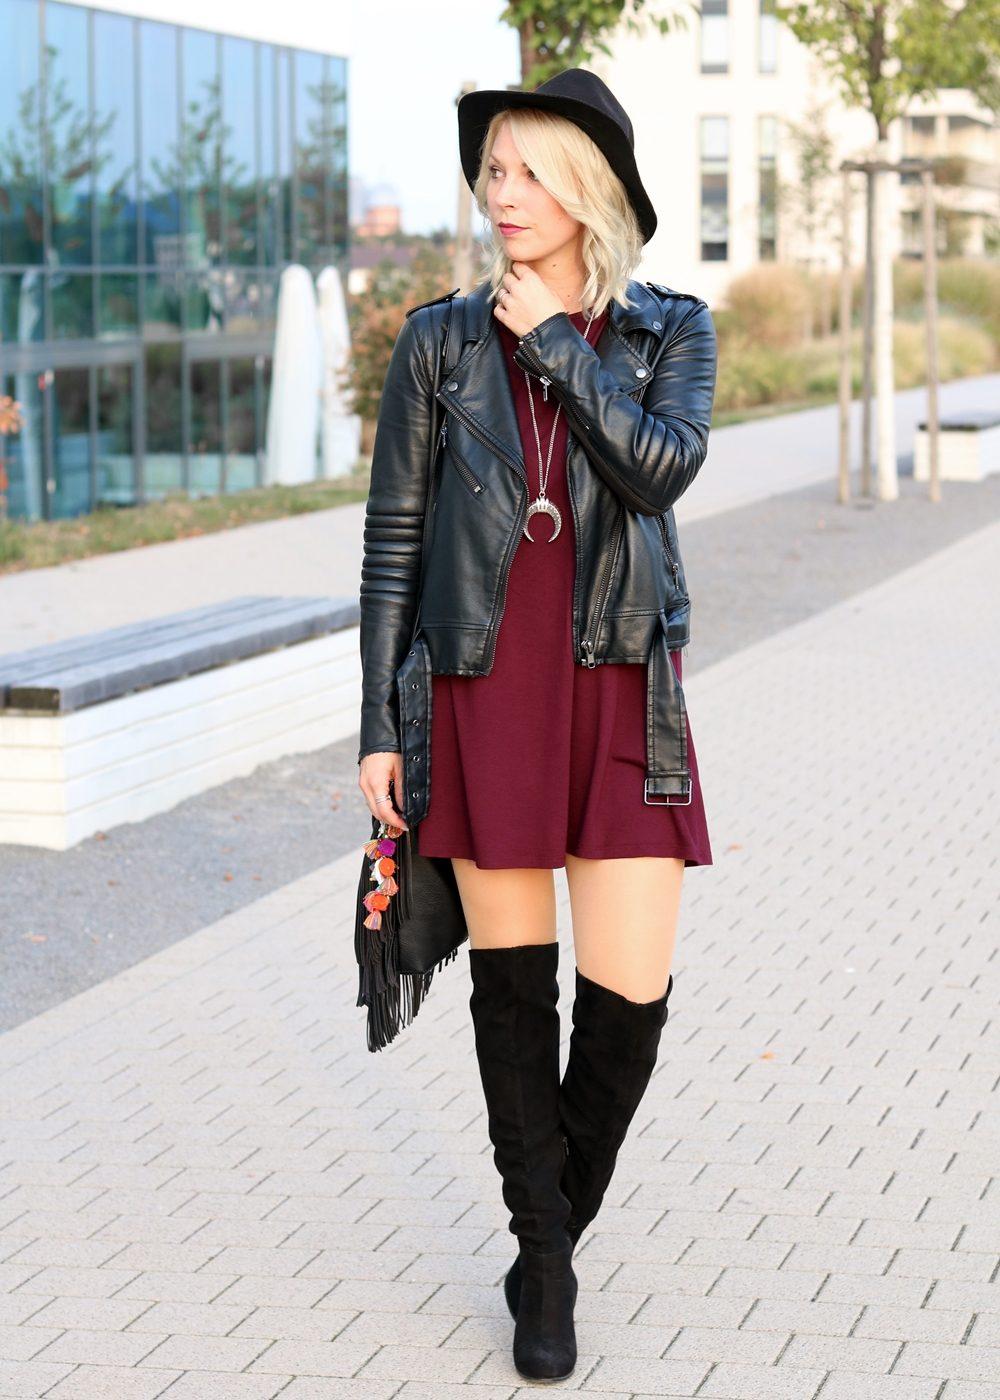 fashionblogger-outfit-karlsruhe-kleid-bordeaux-schwarze-overknees-hut-lederjacke-fransentasche-2